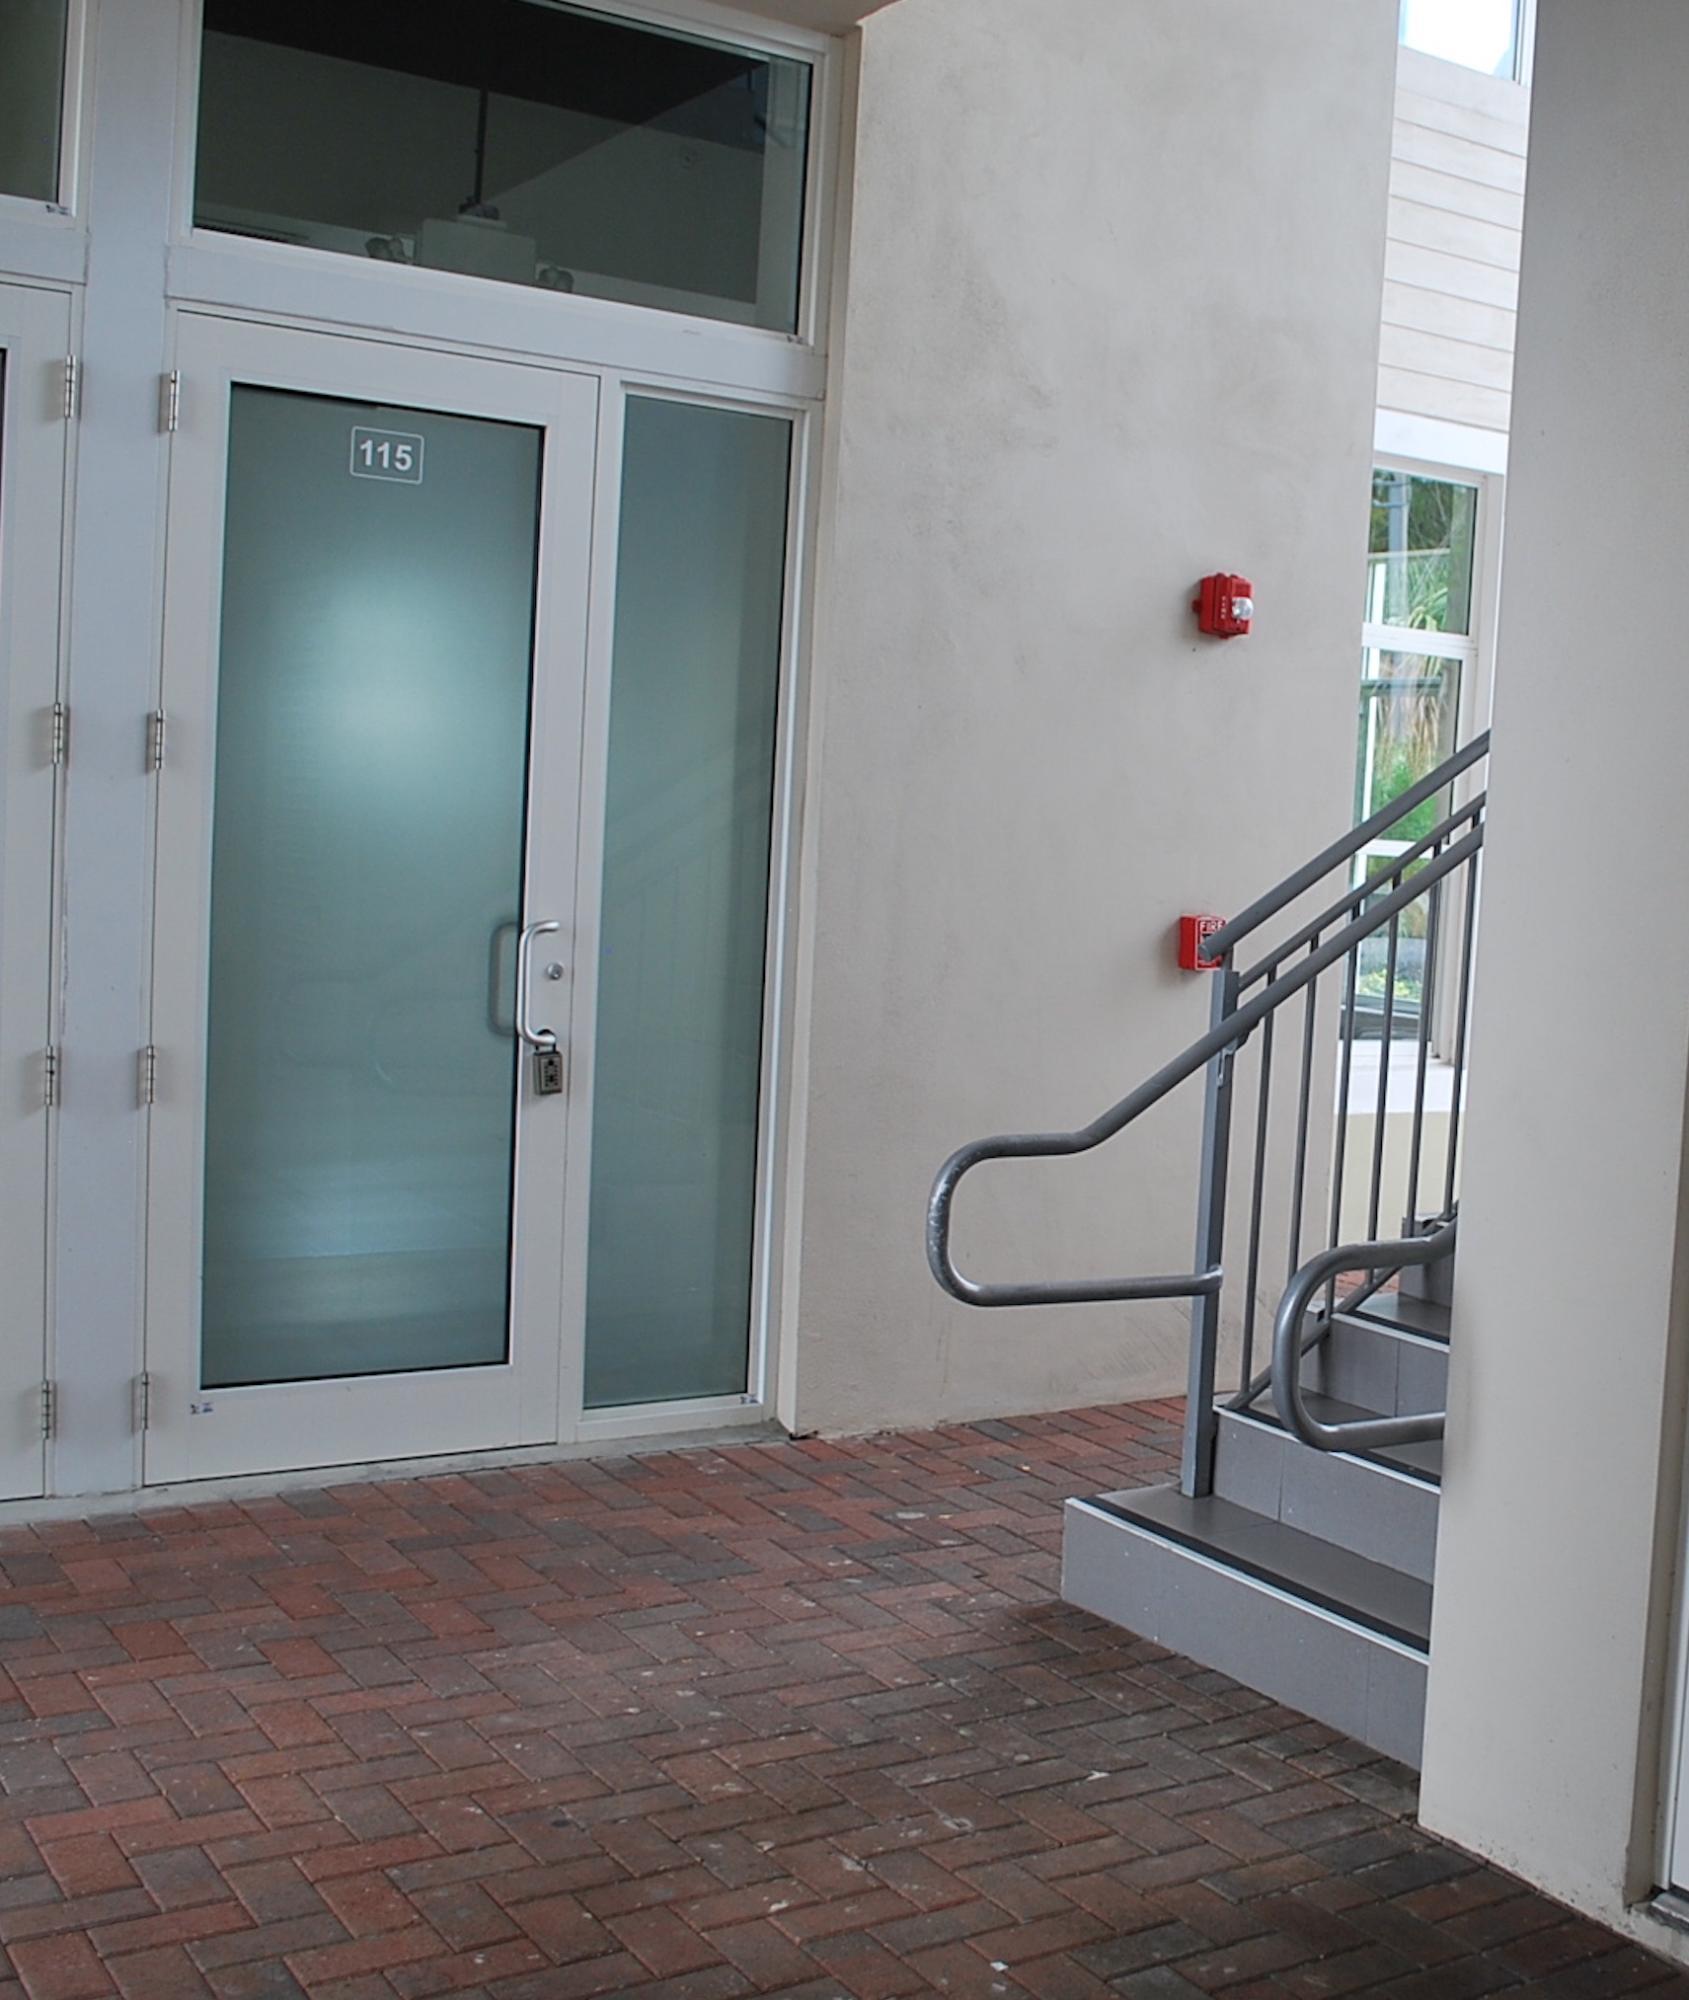 5199 10 Avenue 115 Greenacres, FL 33463 photo 3